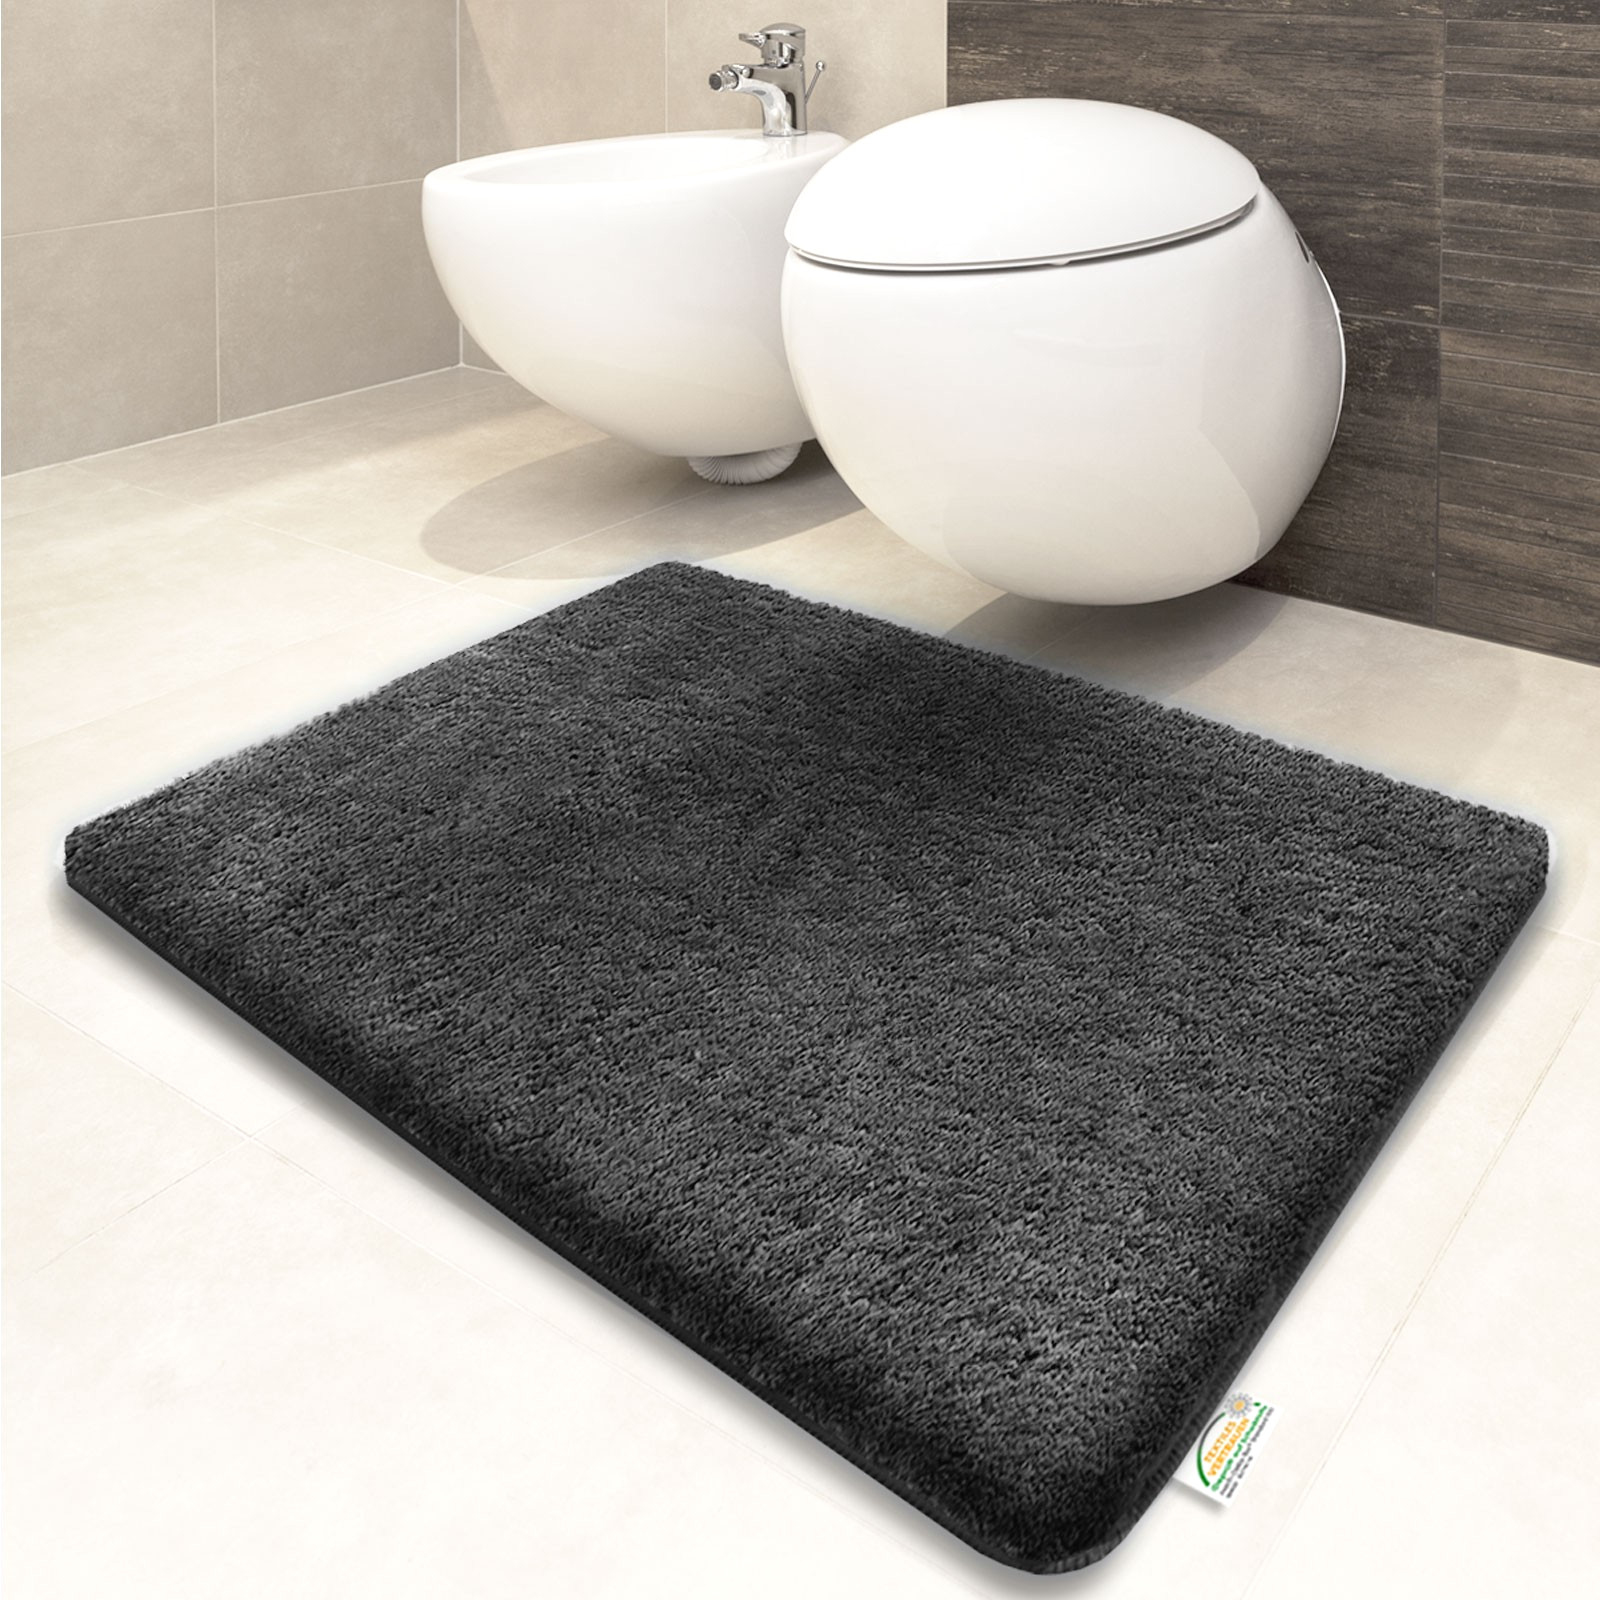 carrelage antid rapant salle de bain castorama beau photos splendid tapis de bain antid rapant. Black Bedroom Furniture Sets. Home Design Ideas